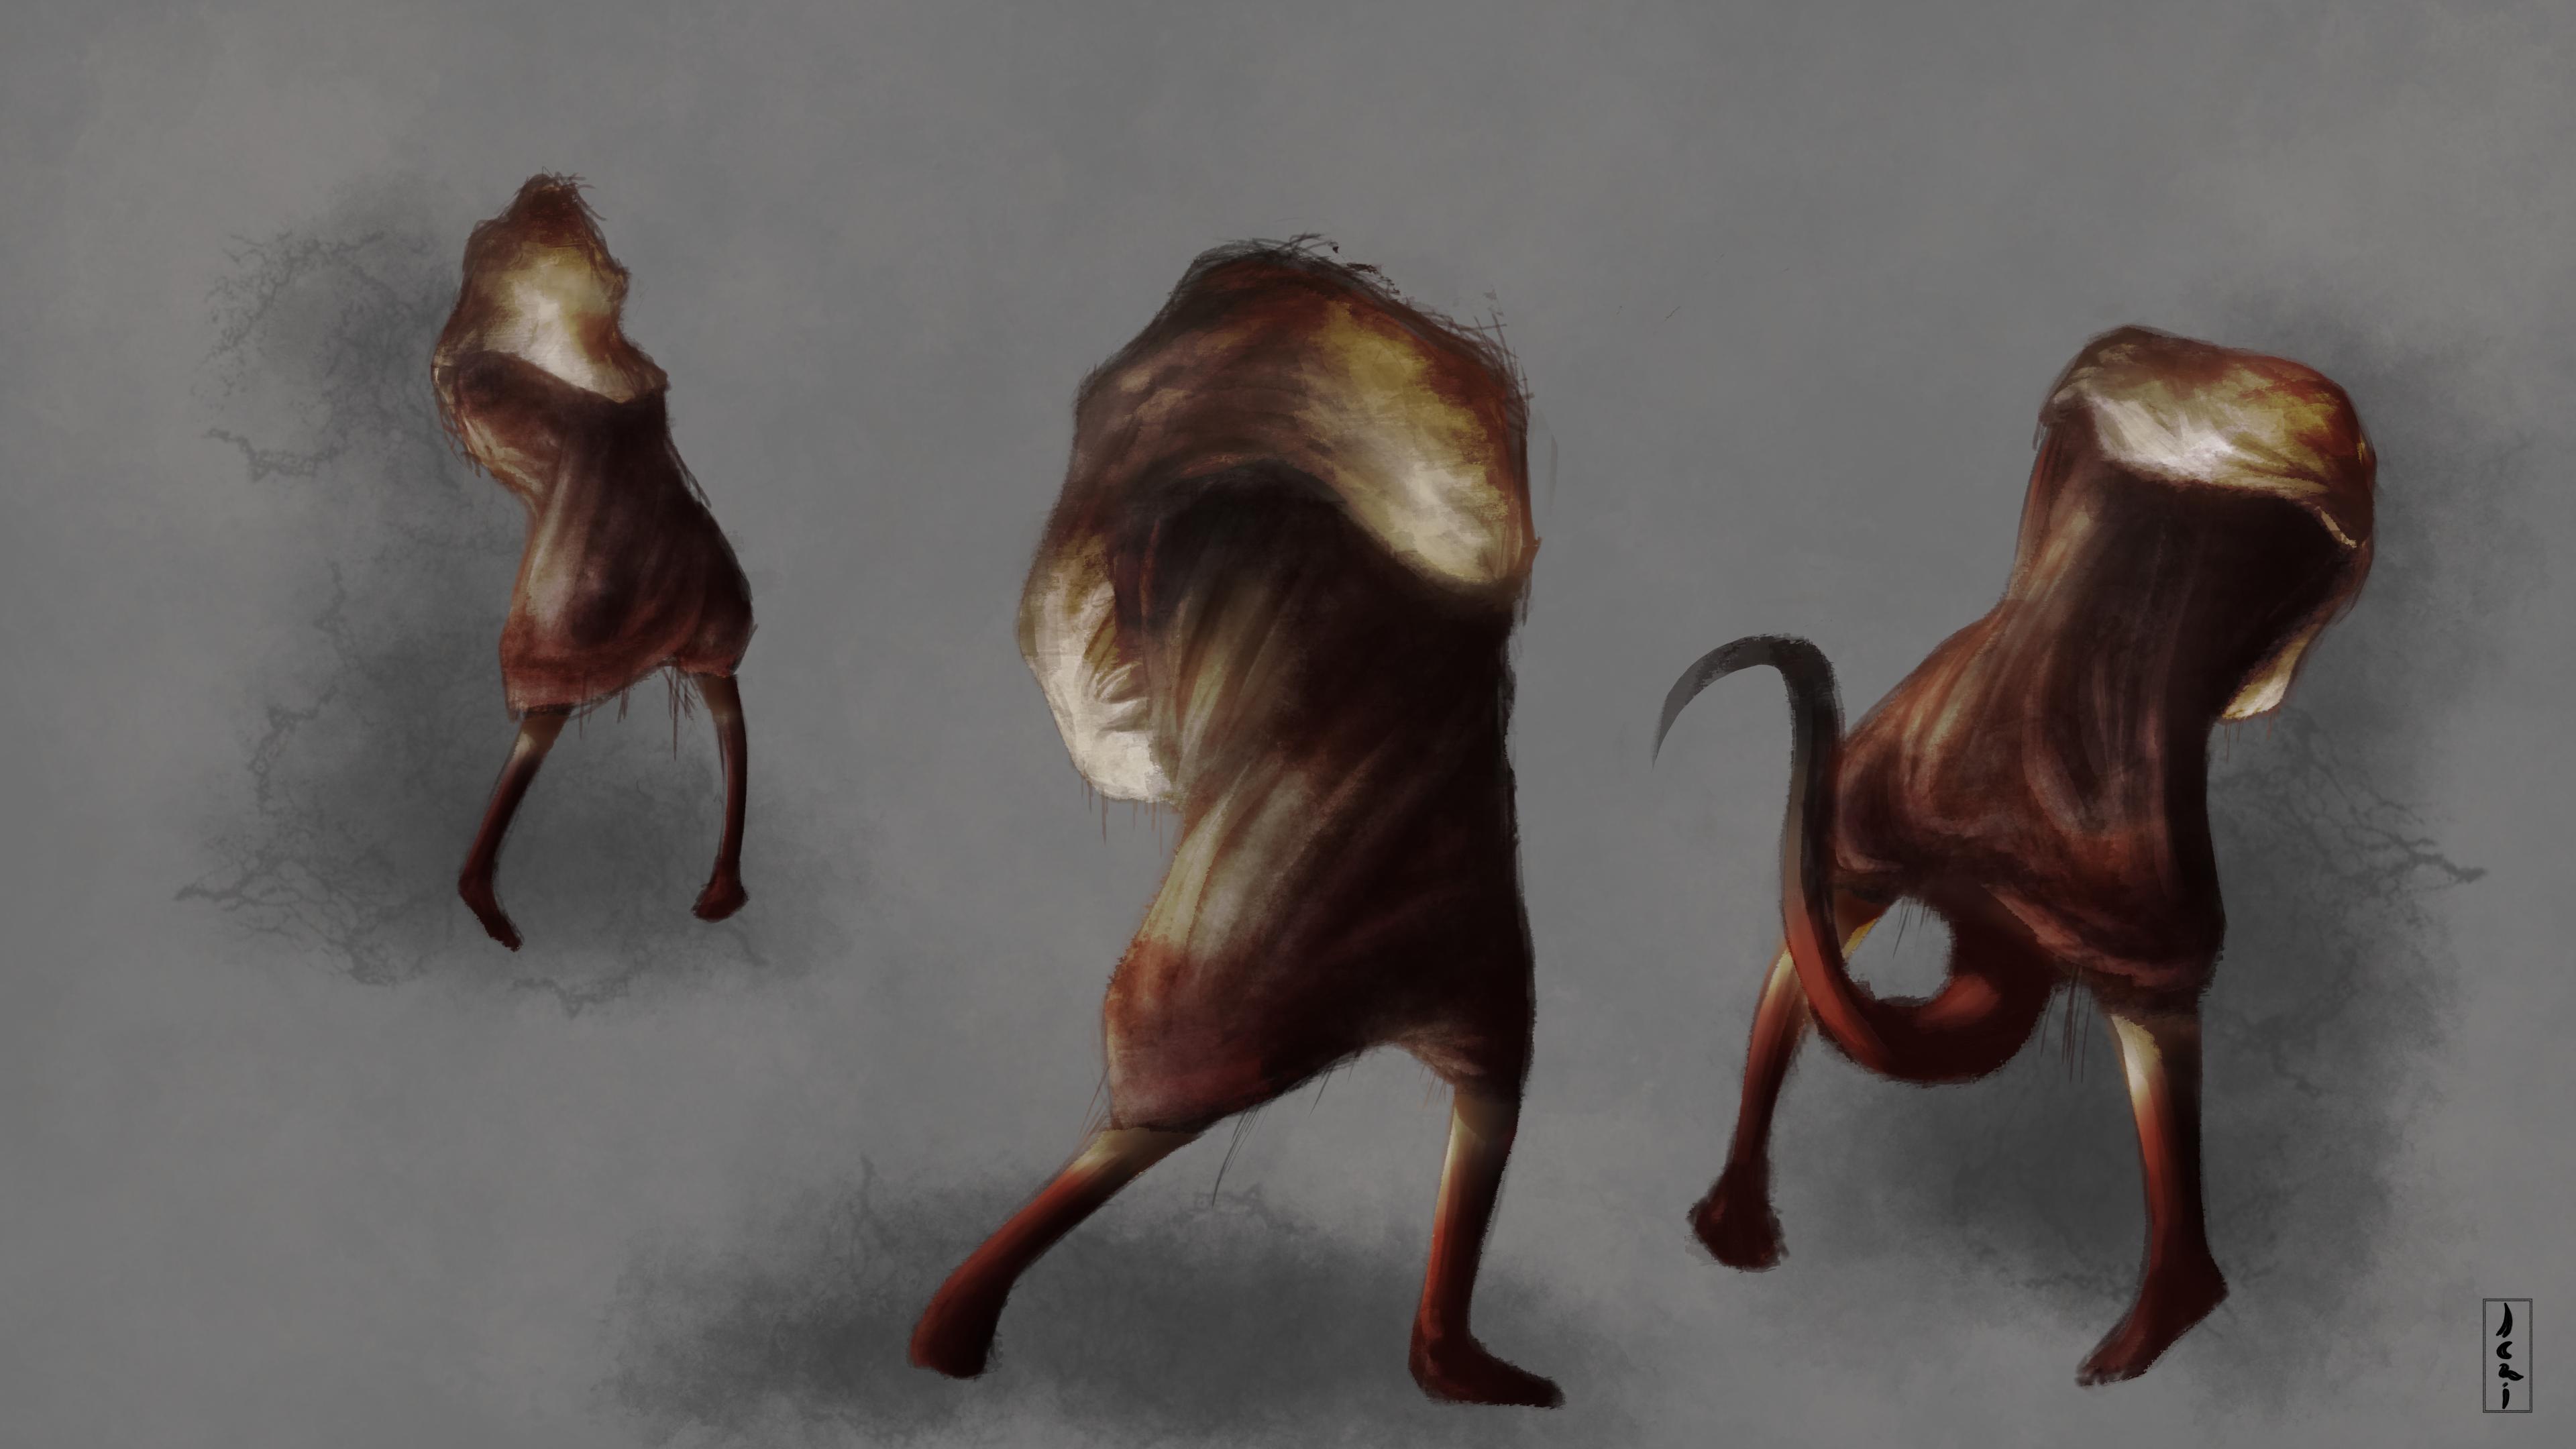 Silent Hill Inspired Monster Concept By Ichigokitsune On Newgrounds